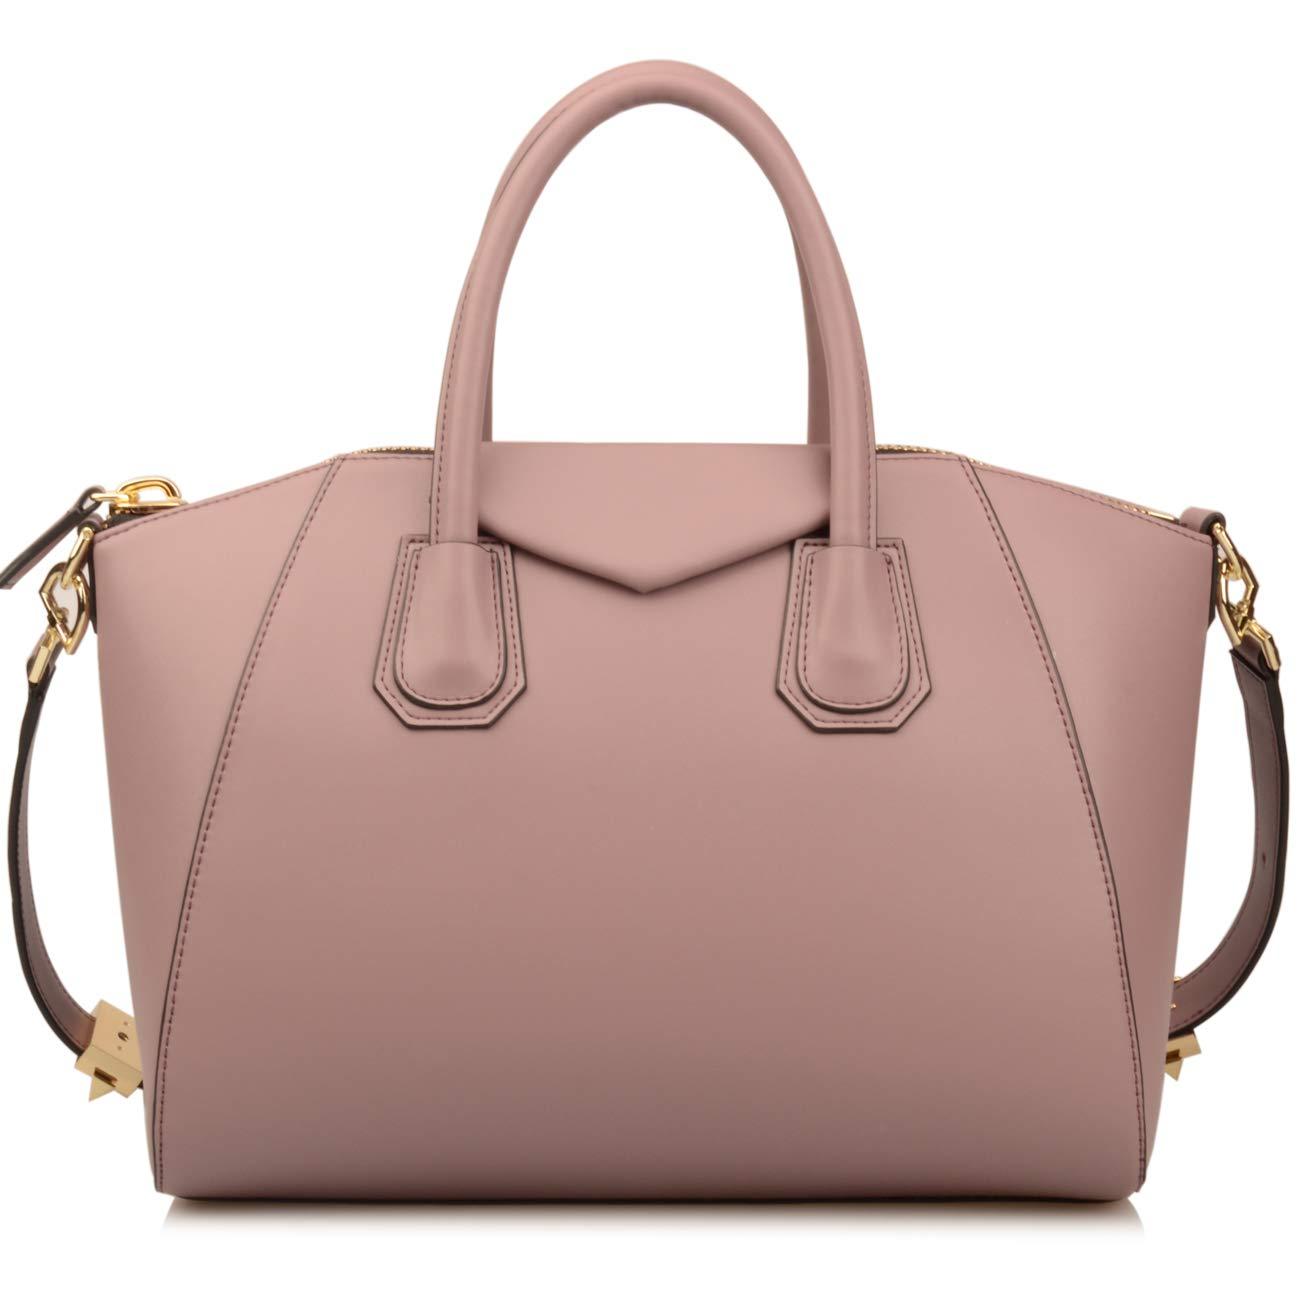 Ainifeel Women's Genuine Leather Everyday Purse Top Handle Handbags Shoulder Bags (Medium, Lavender)